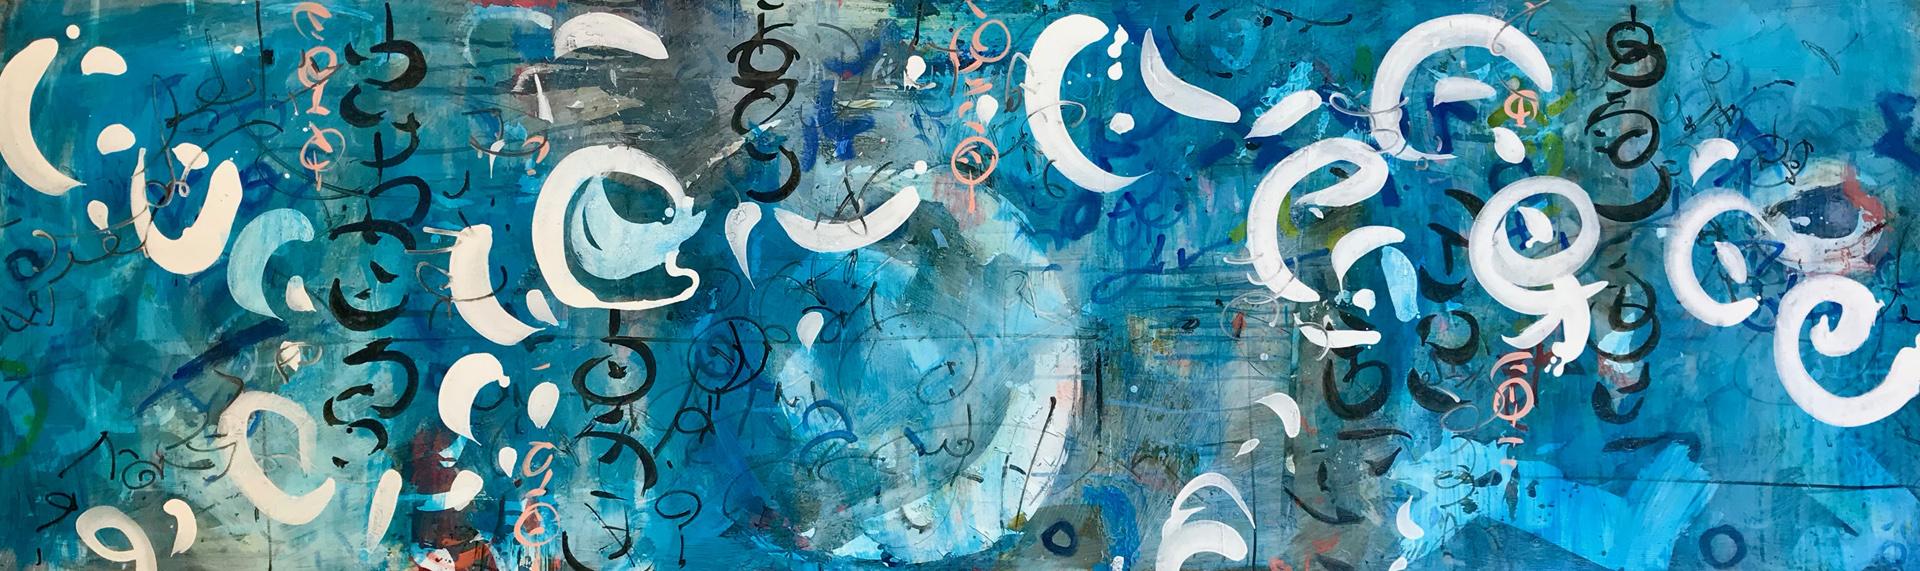 "Blue Moon, 18"" x 60"", 2019."